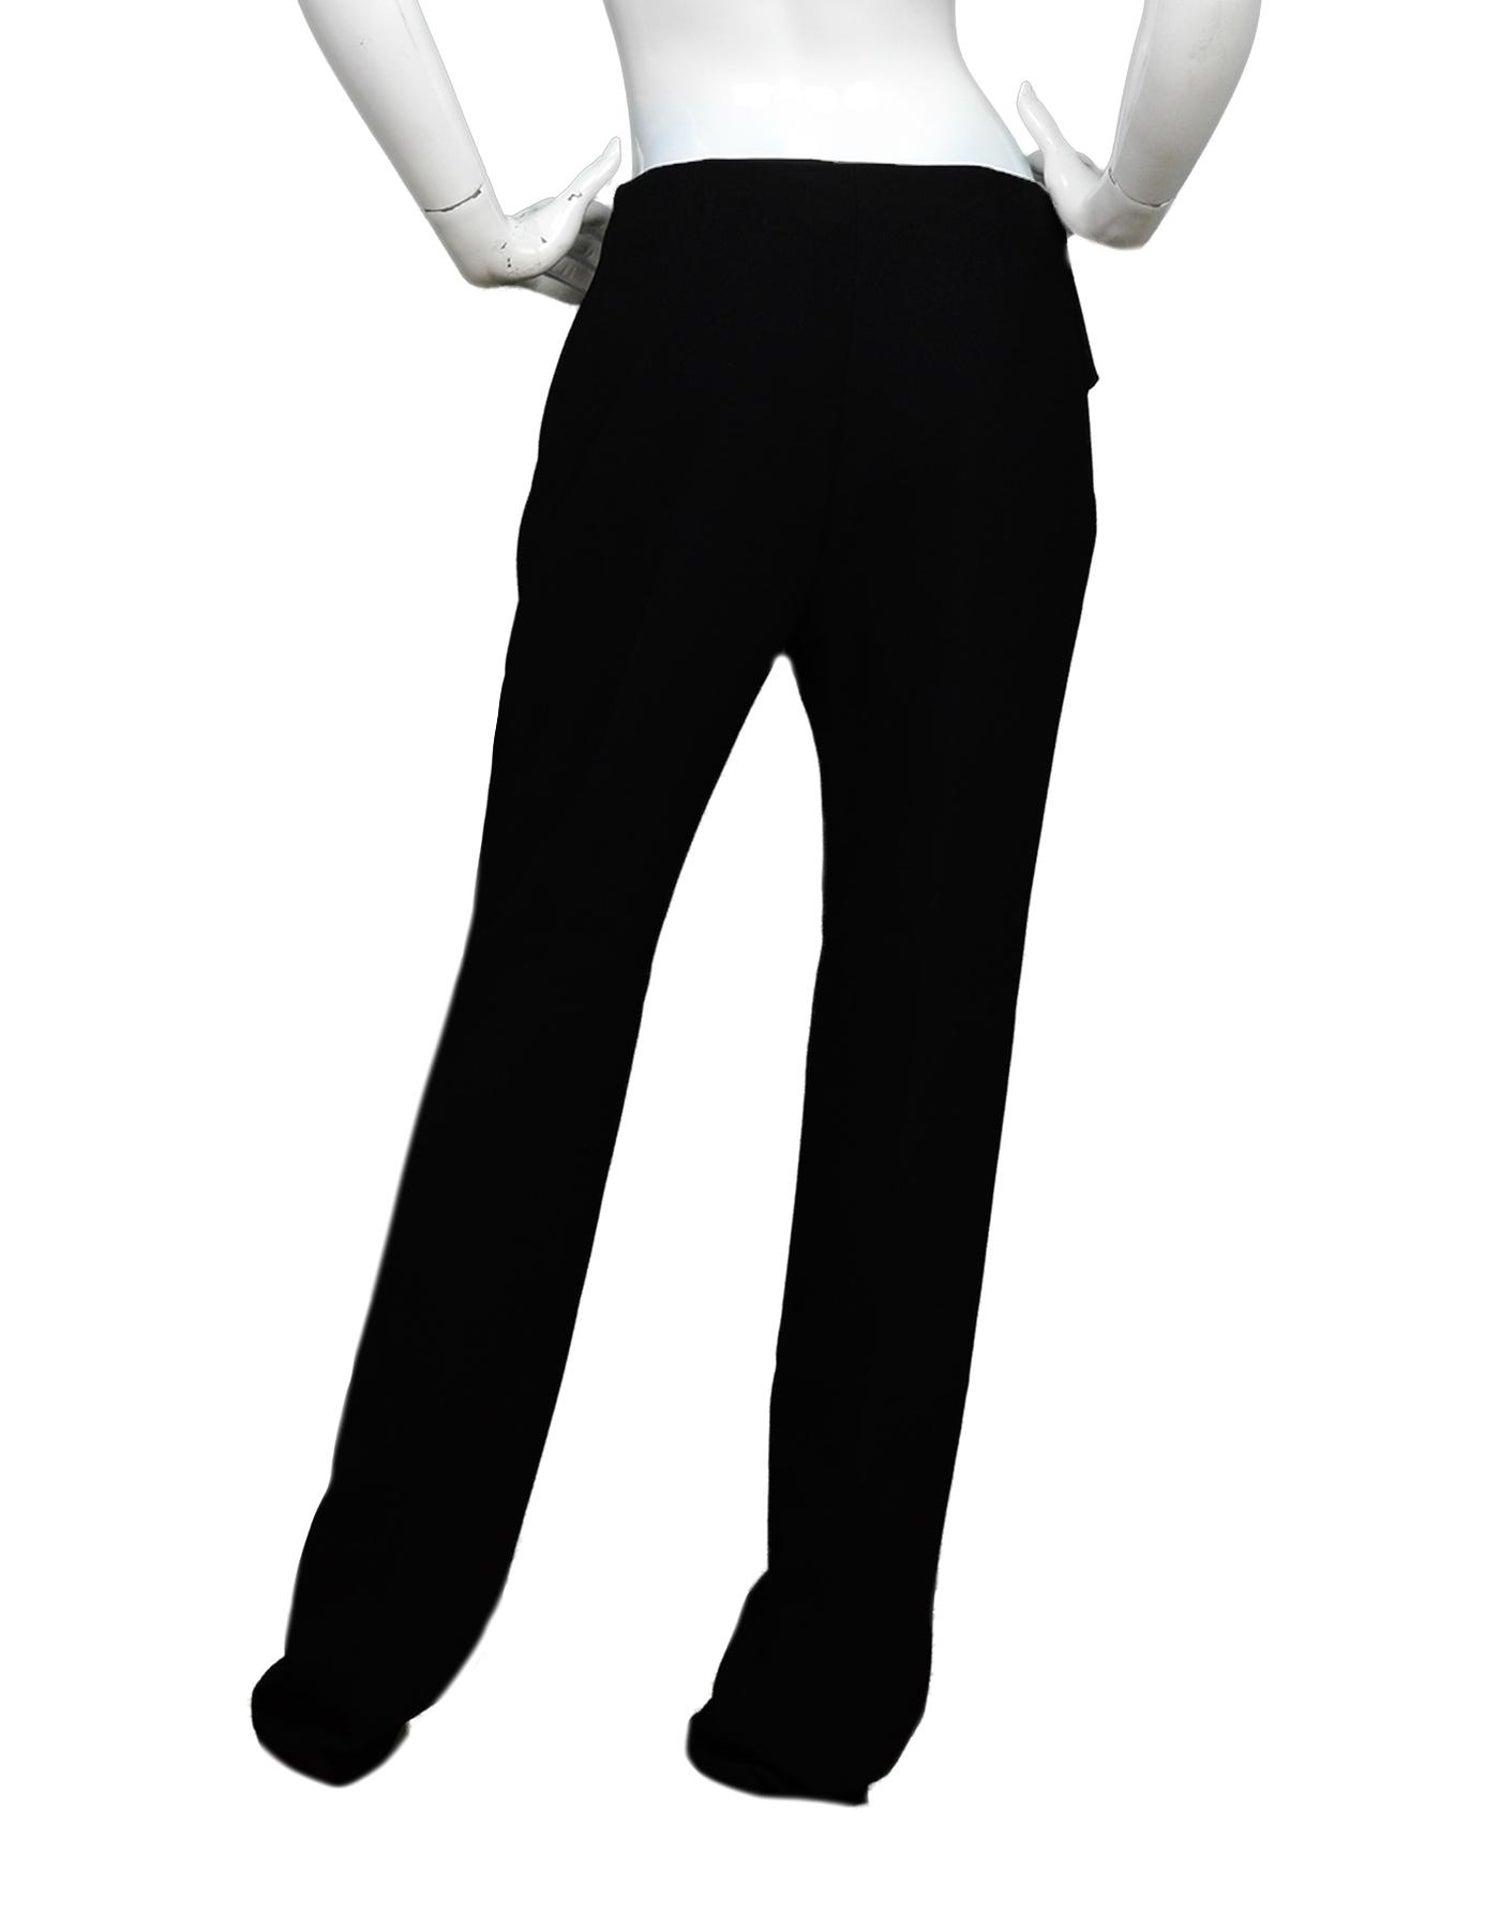 Balenciaga Black Slacks Pants W/ Ruffle Overlay Sz 42 For Sale at 1stdibs